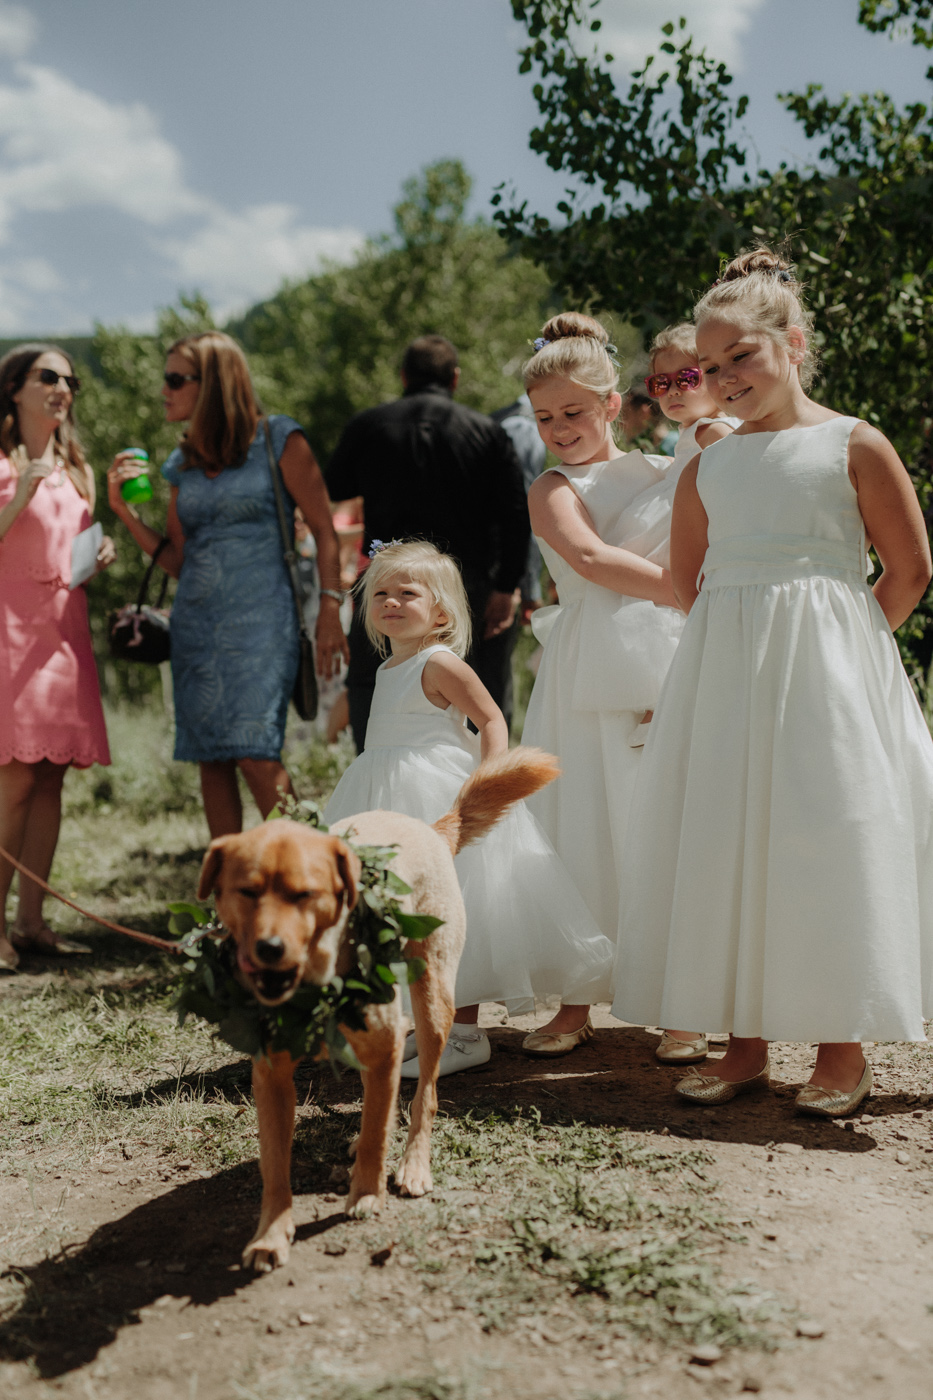 woods-walk-trail-crested-butte-colorado-wedding-20.jpg